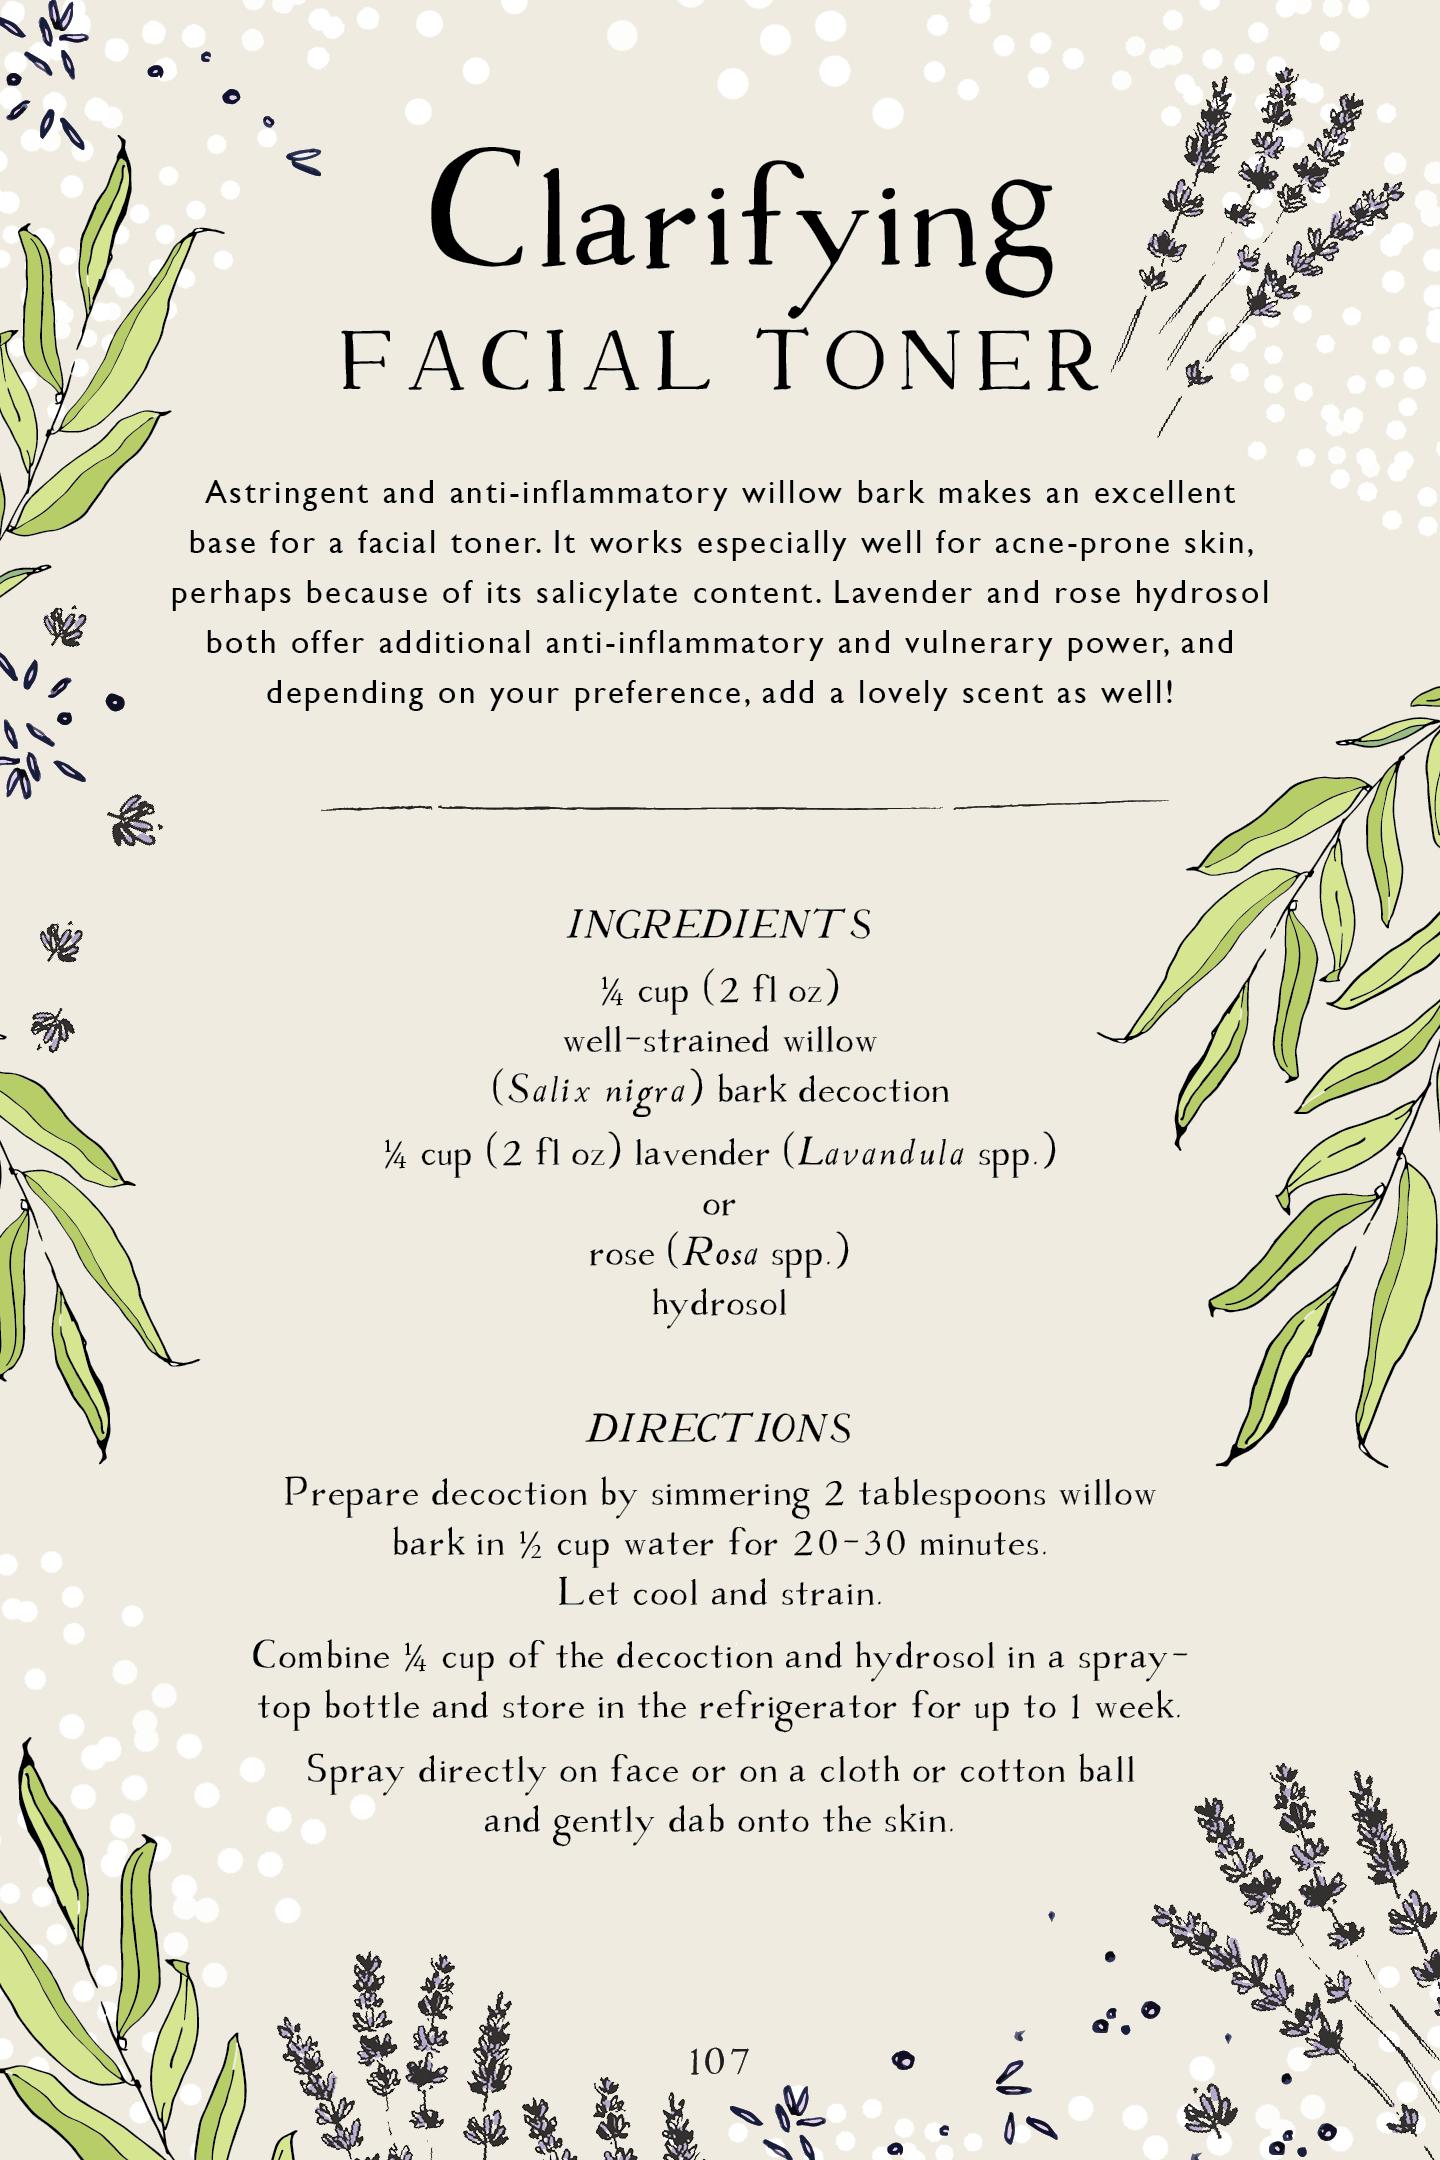 Botanical Skin Care Recipe Book Page Preview – Clarifying Facial Toner